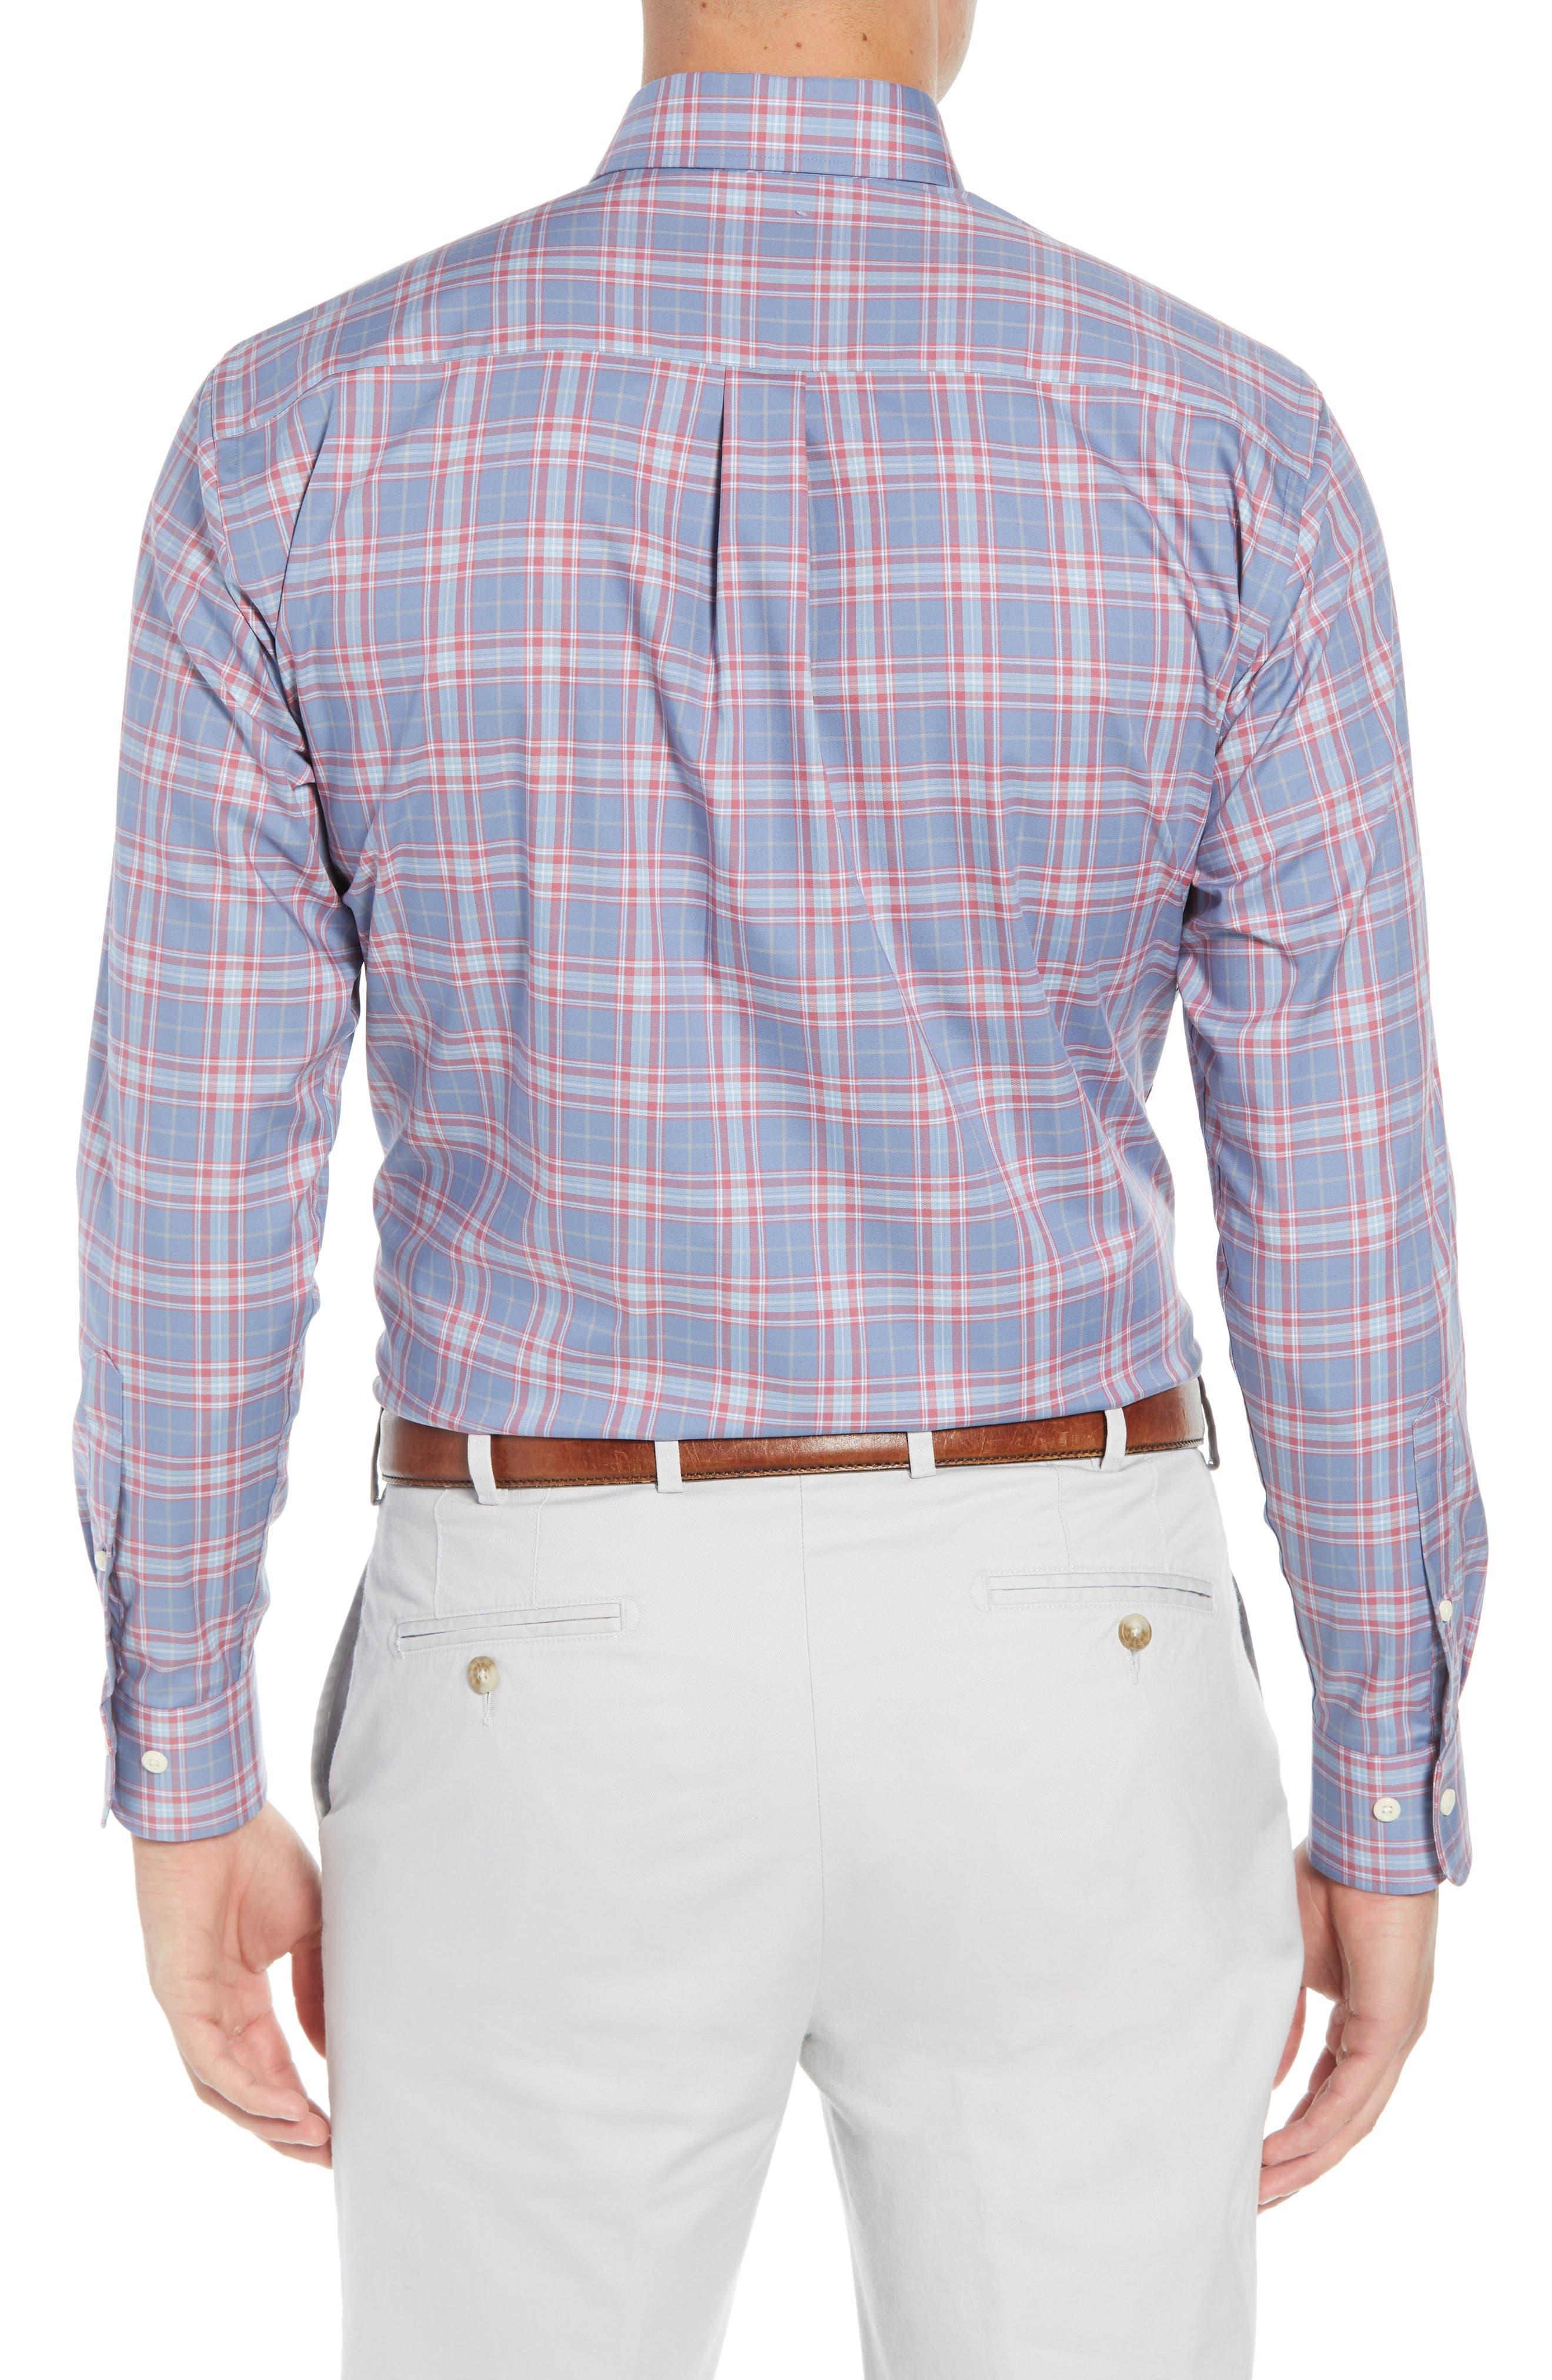 Crown Ease Archipelago Regular Fit Plaid Sport Shirt,                             Alternate thumbnail 3, color,                             524